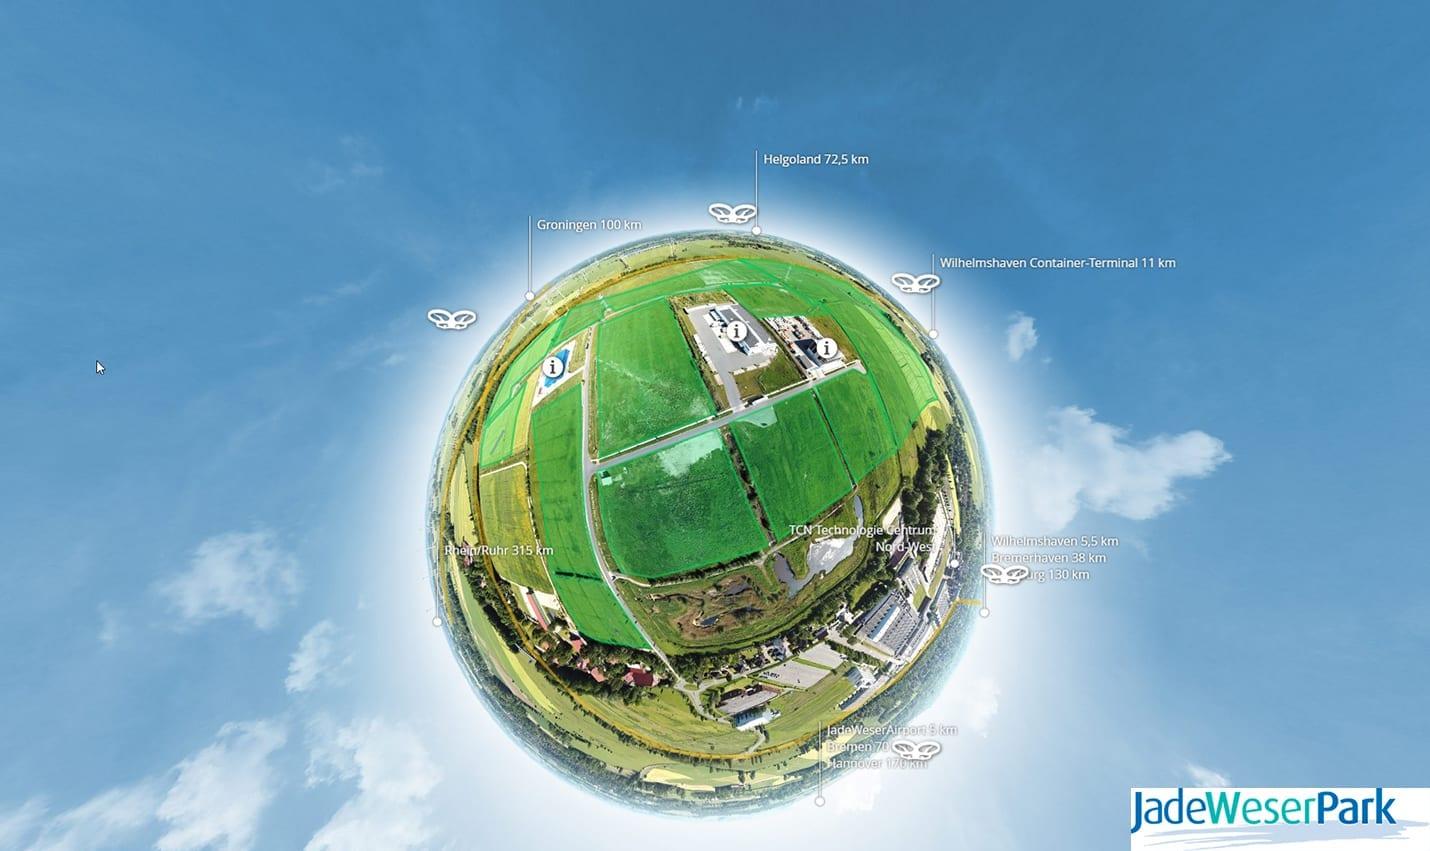 Virtuelle Tour Jade-Weser Park Tiny Planet 360 Werbeagentur